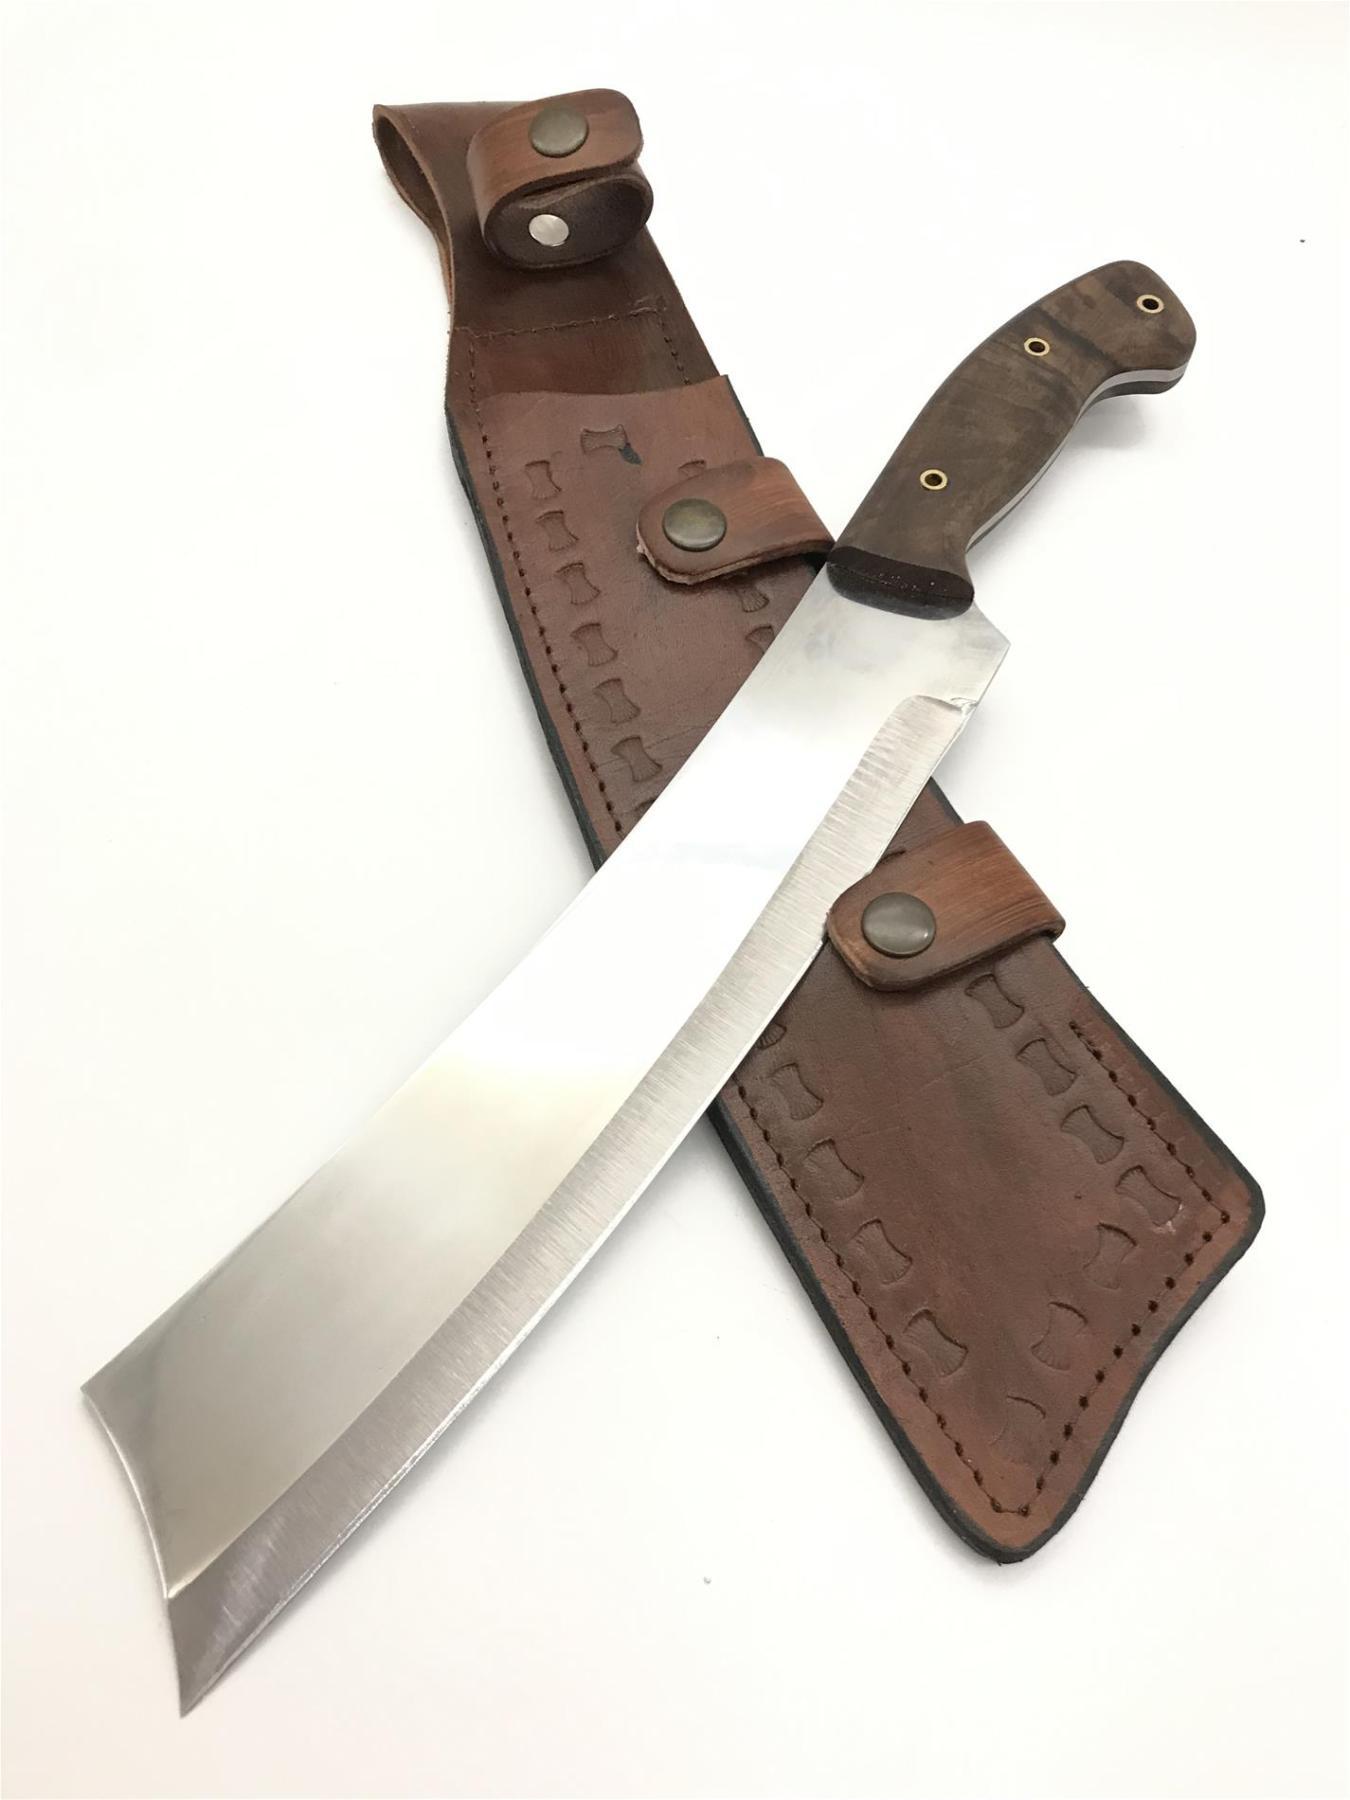 Waving Handmade Camping Knife BB73-2